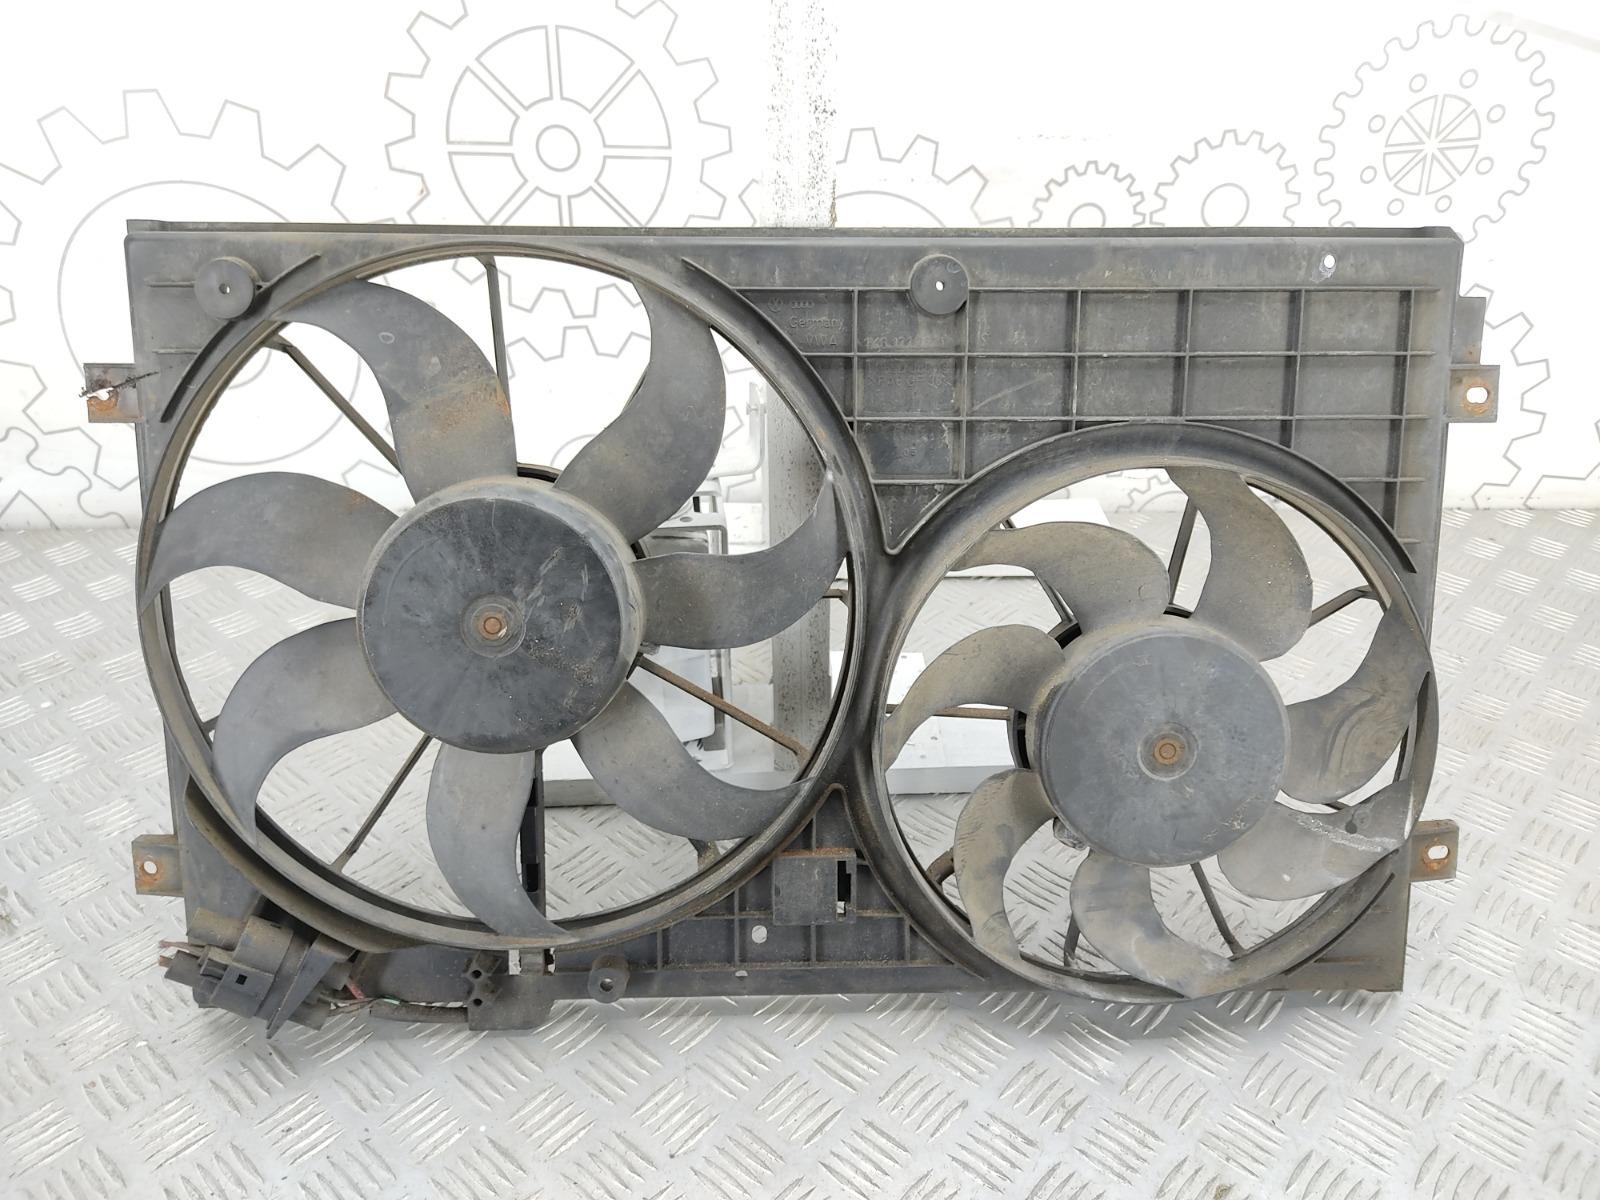 Вентилятор радиатора Skoda Octavia 1.6 I 2005 (б/у)